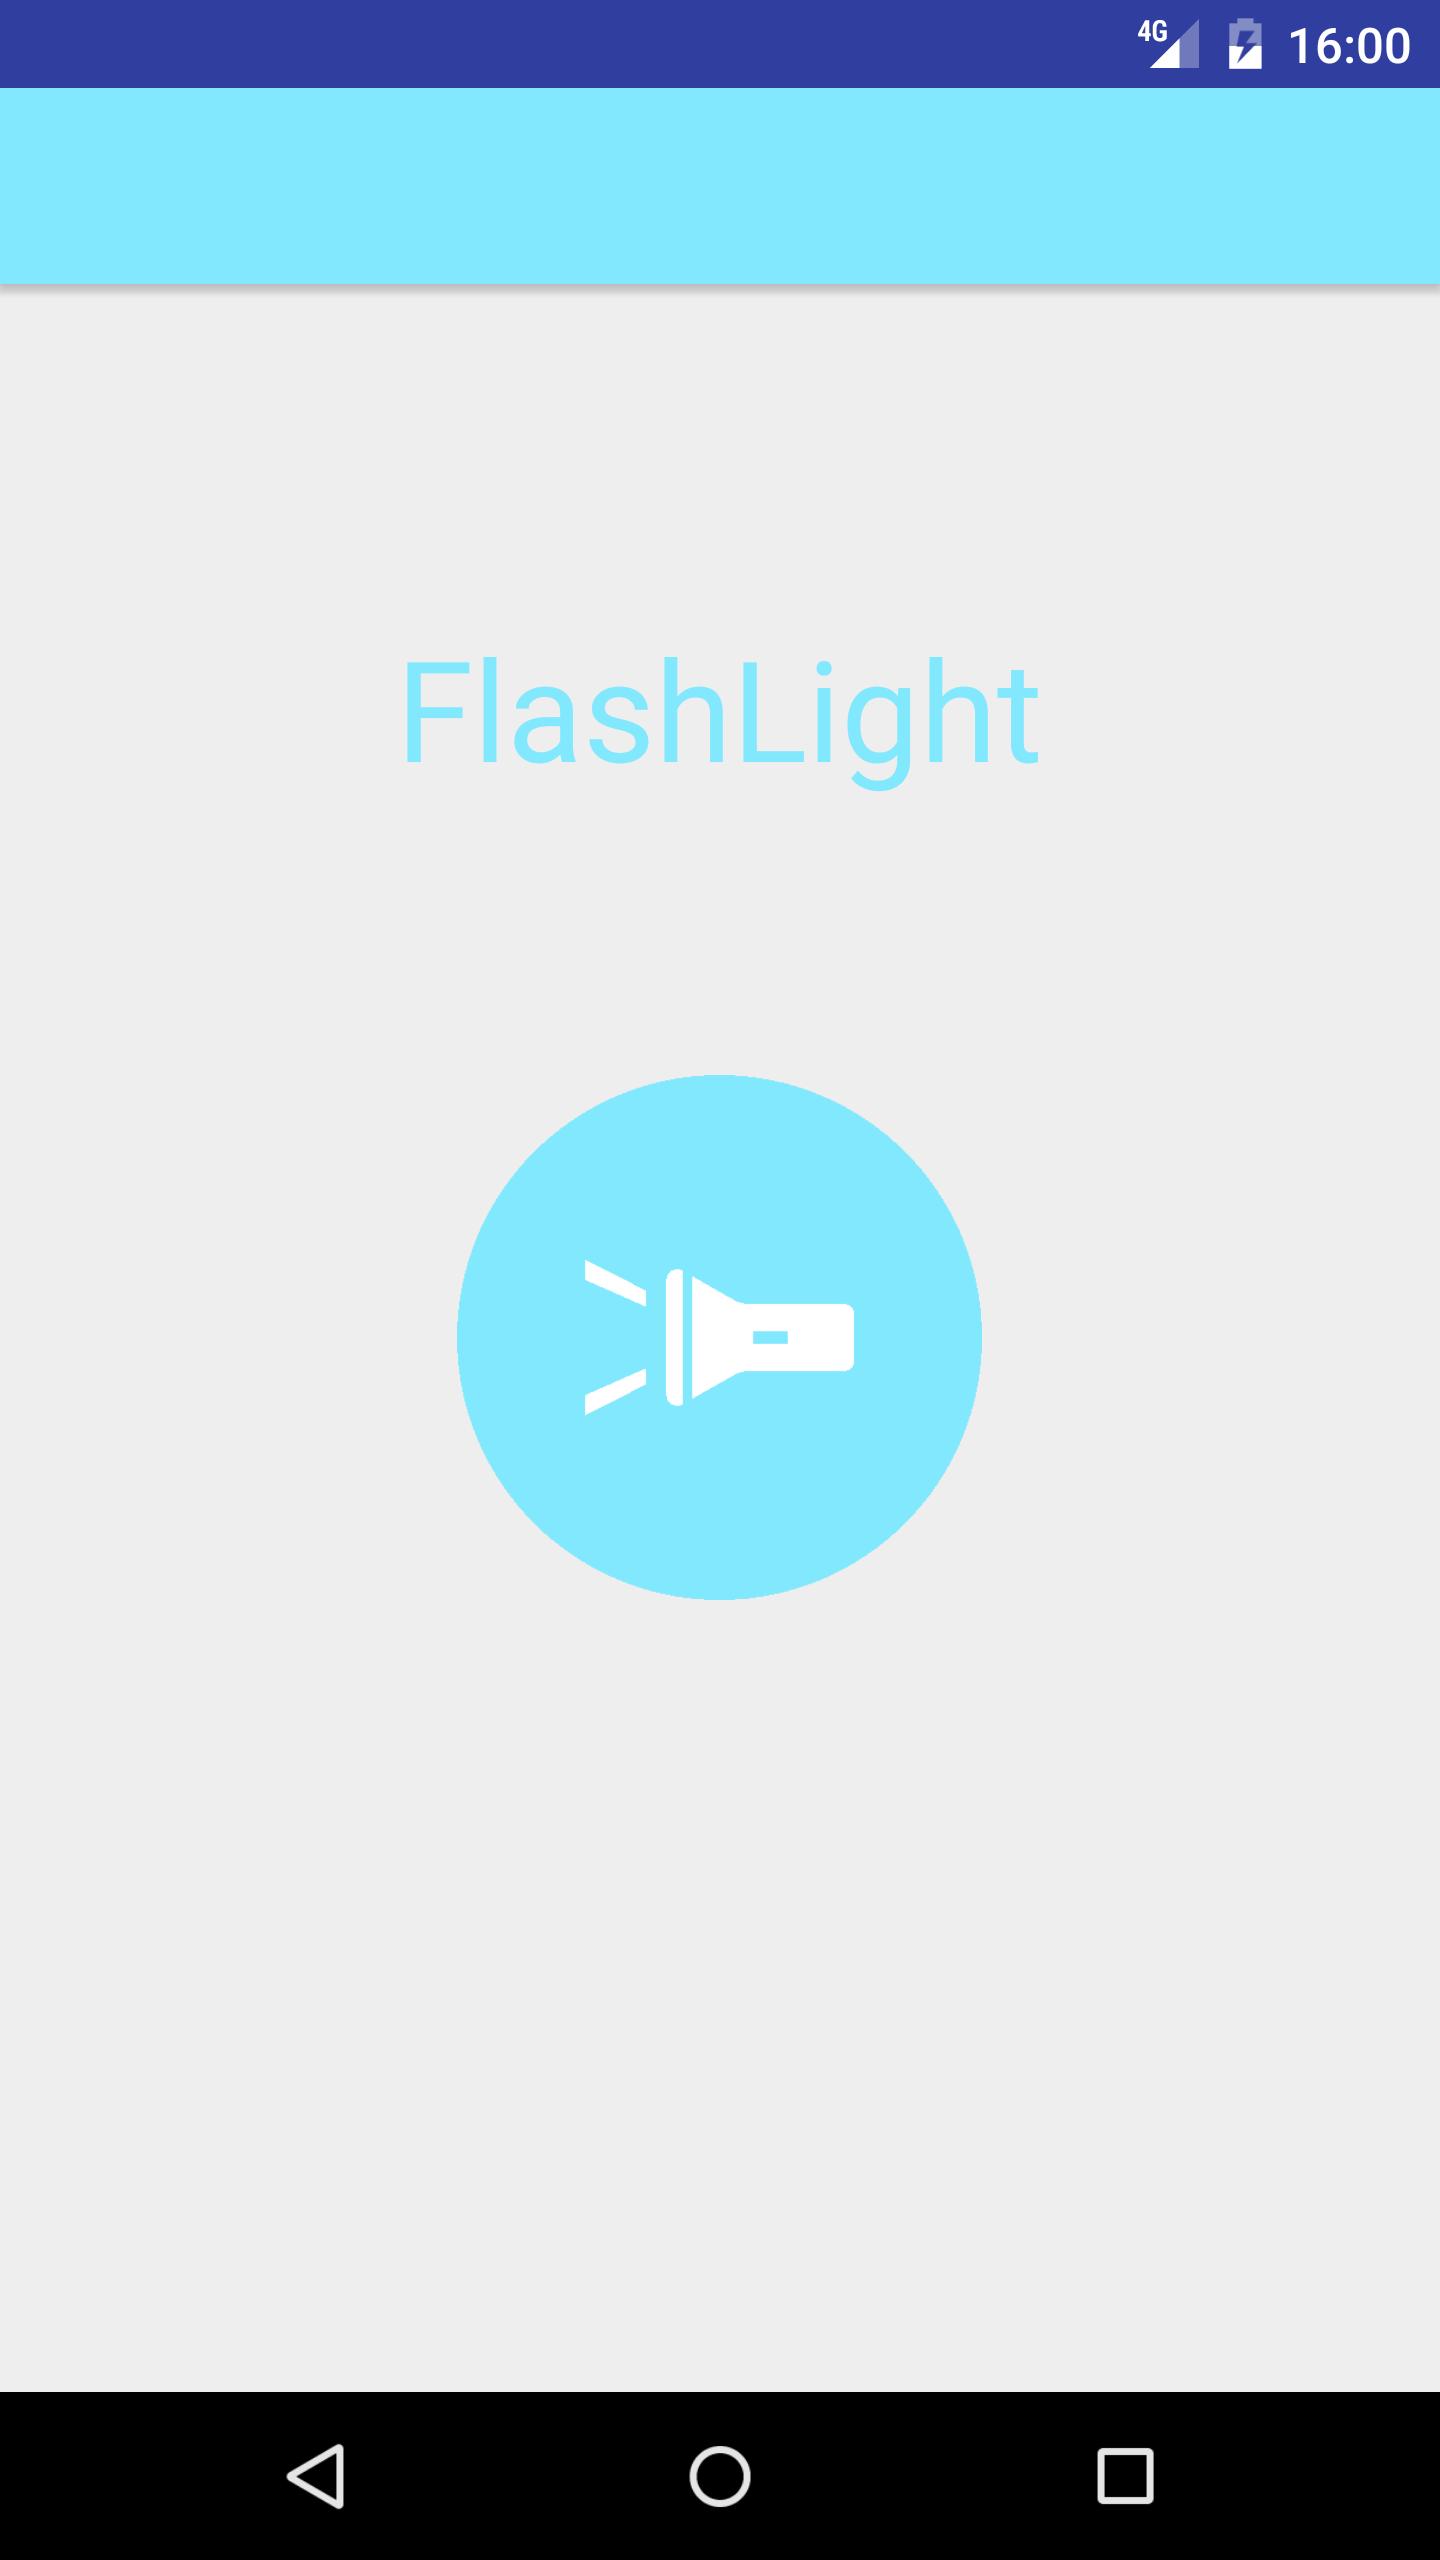 FlashLight_01.png